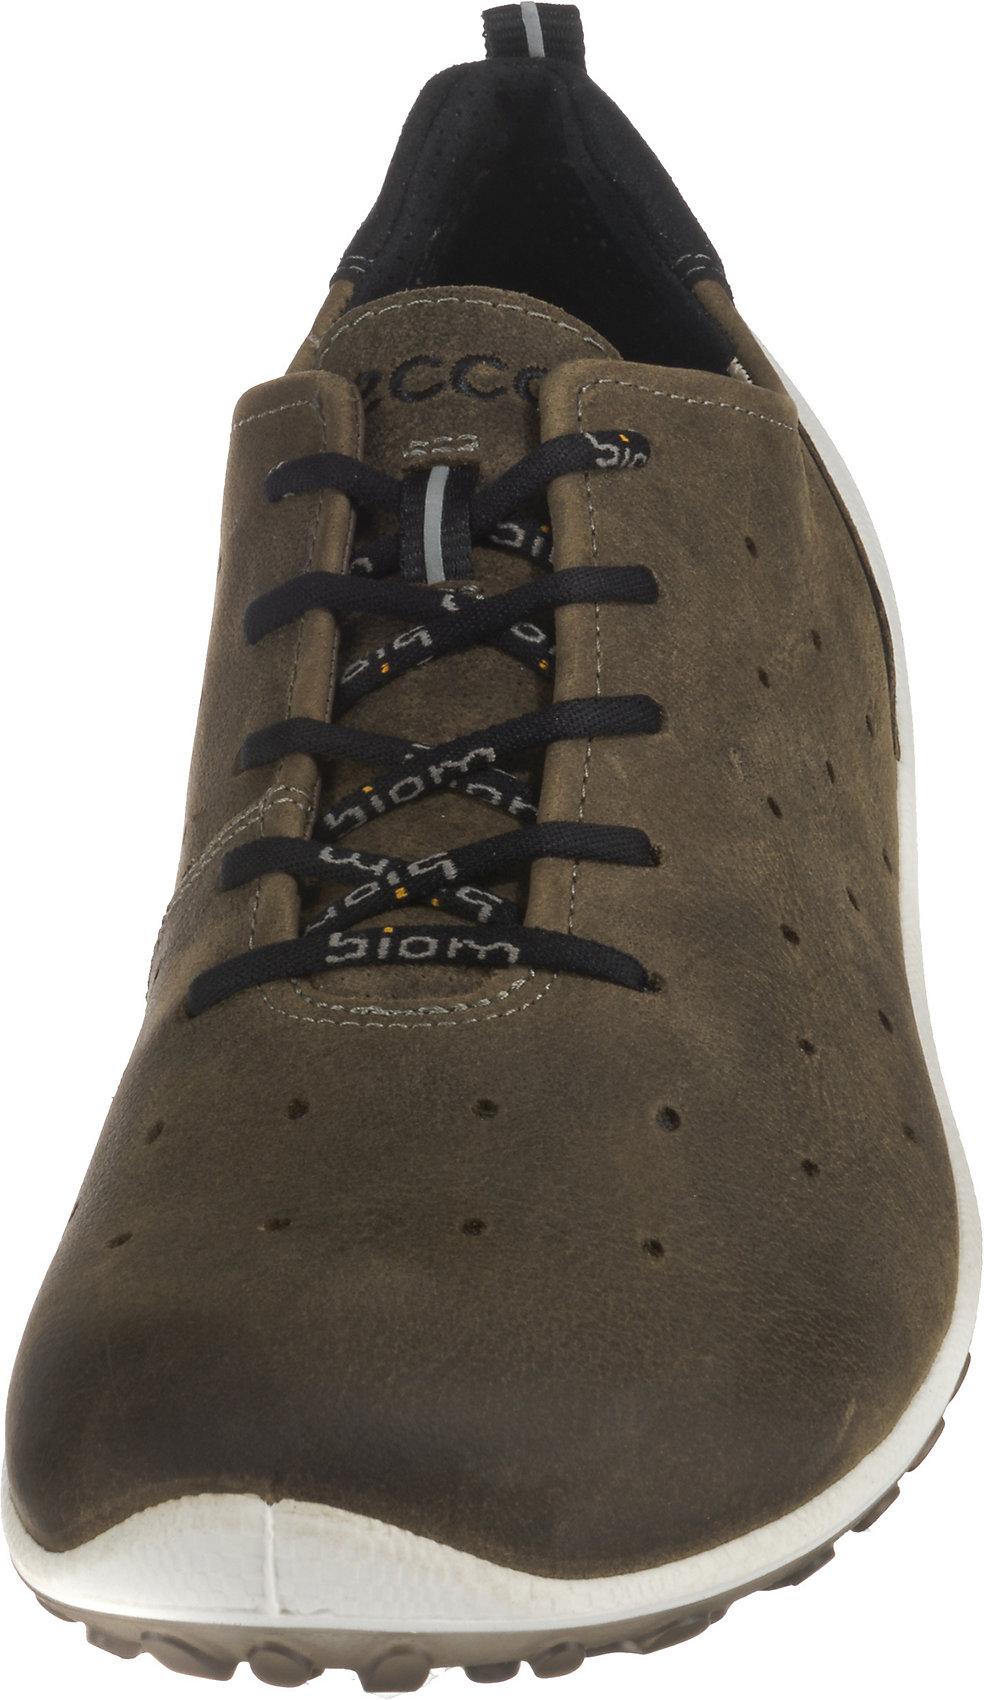 ecco, Ecco Biom Lite M Sneakers Low, grau